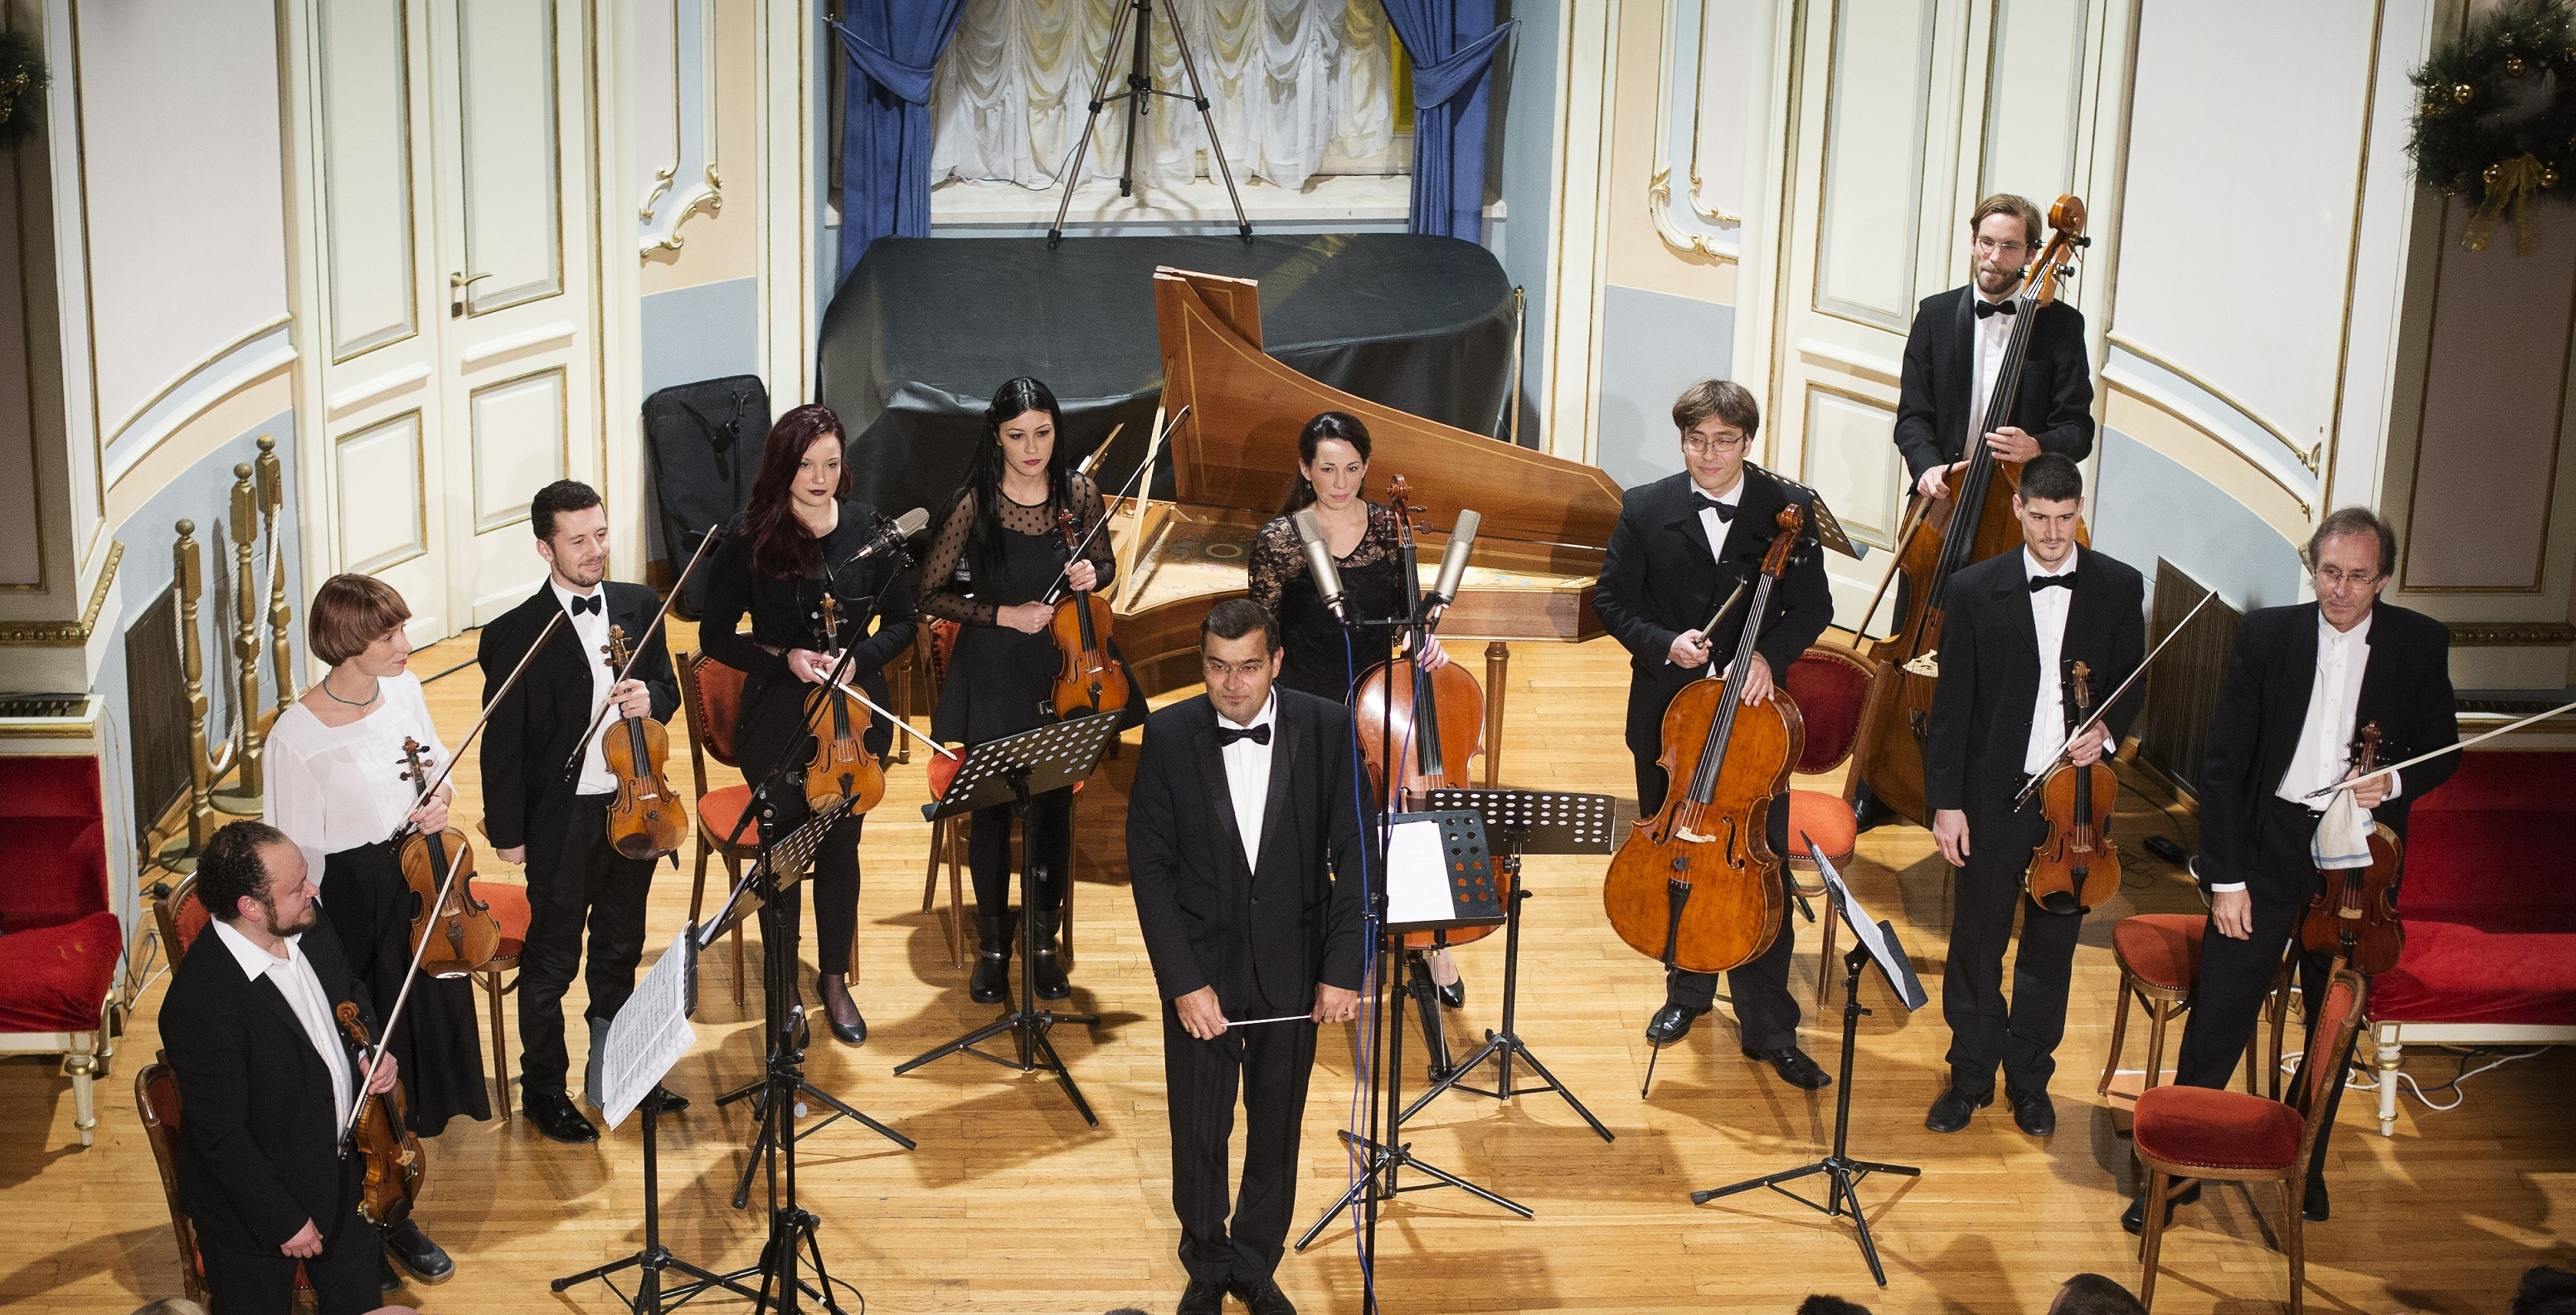 Splitski virtuozi - Virtuosos of Split